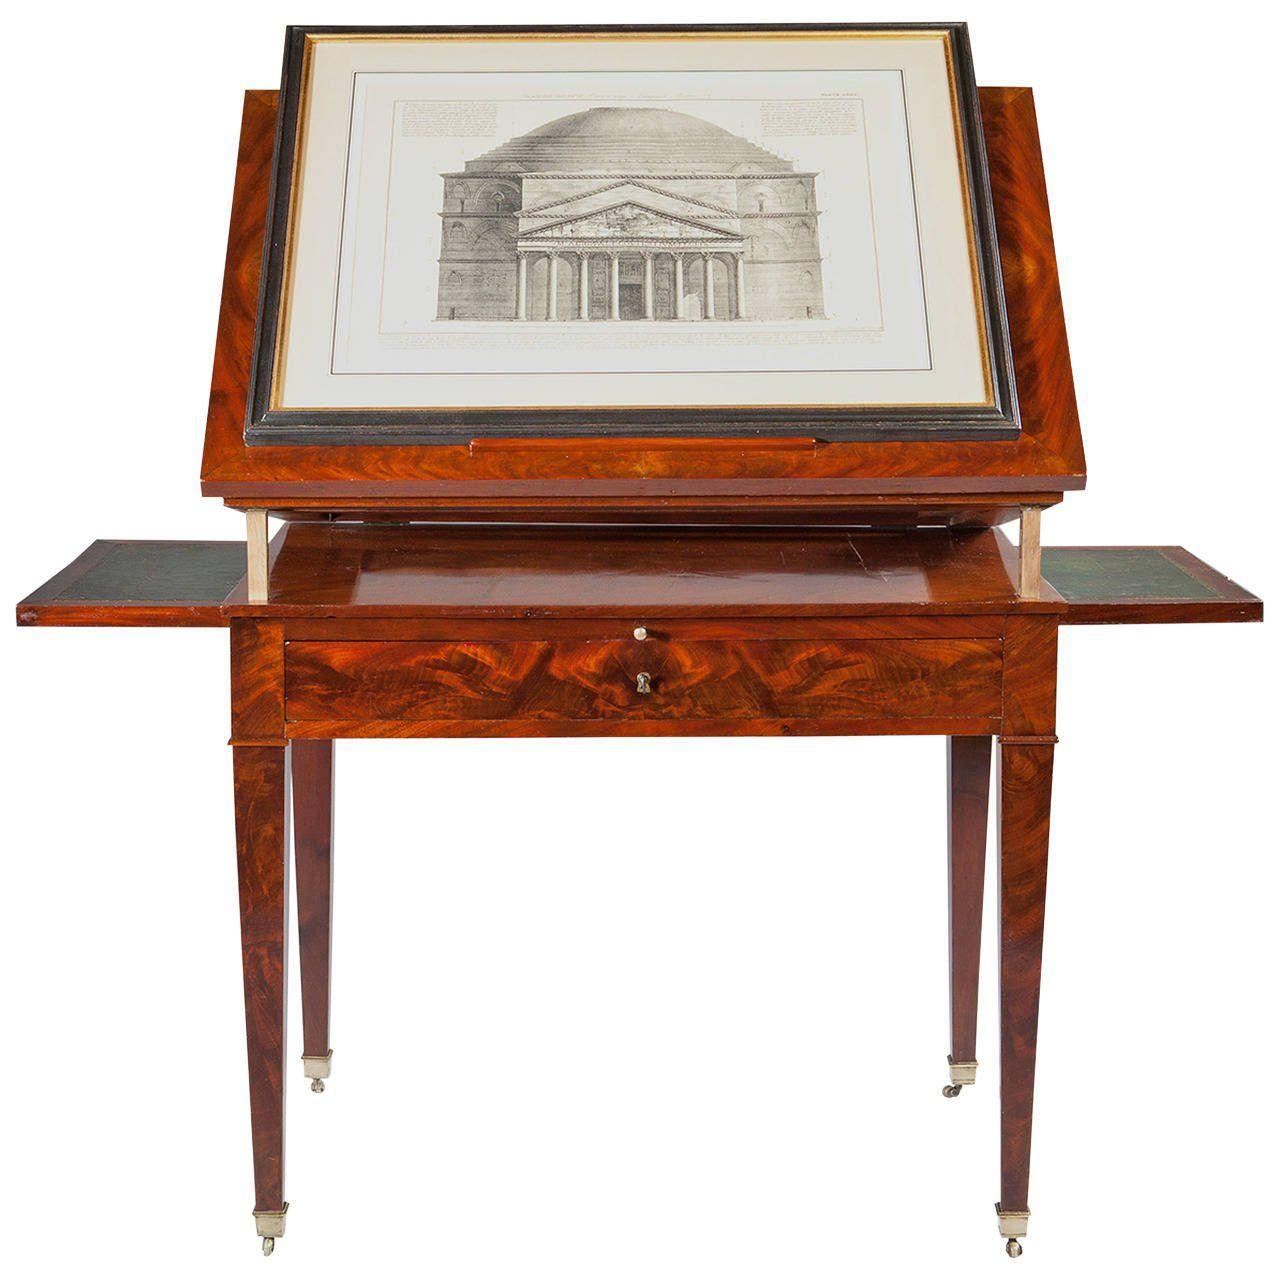 Architect Desks fine early 19th century architect's table | modern, modern desk